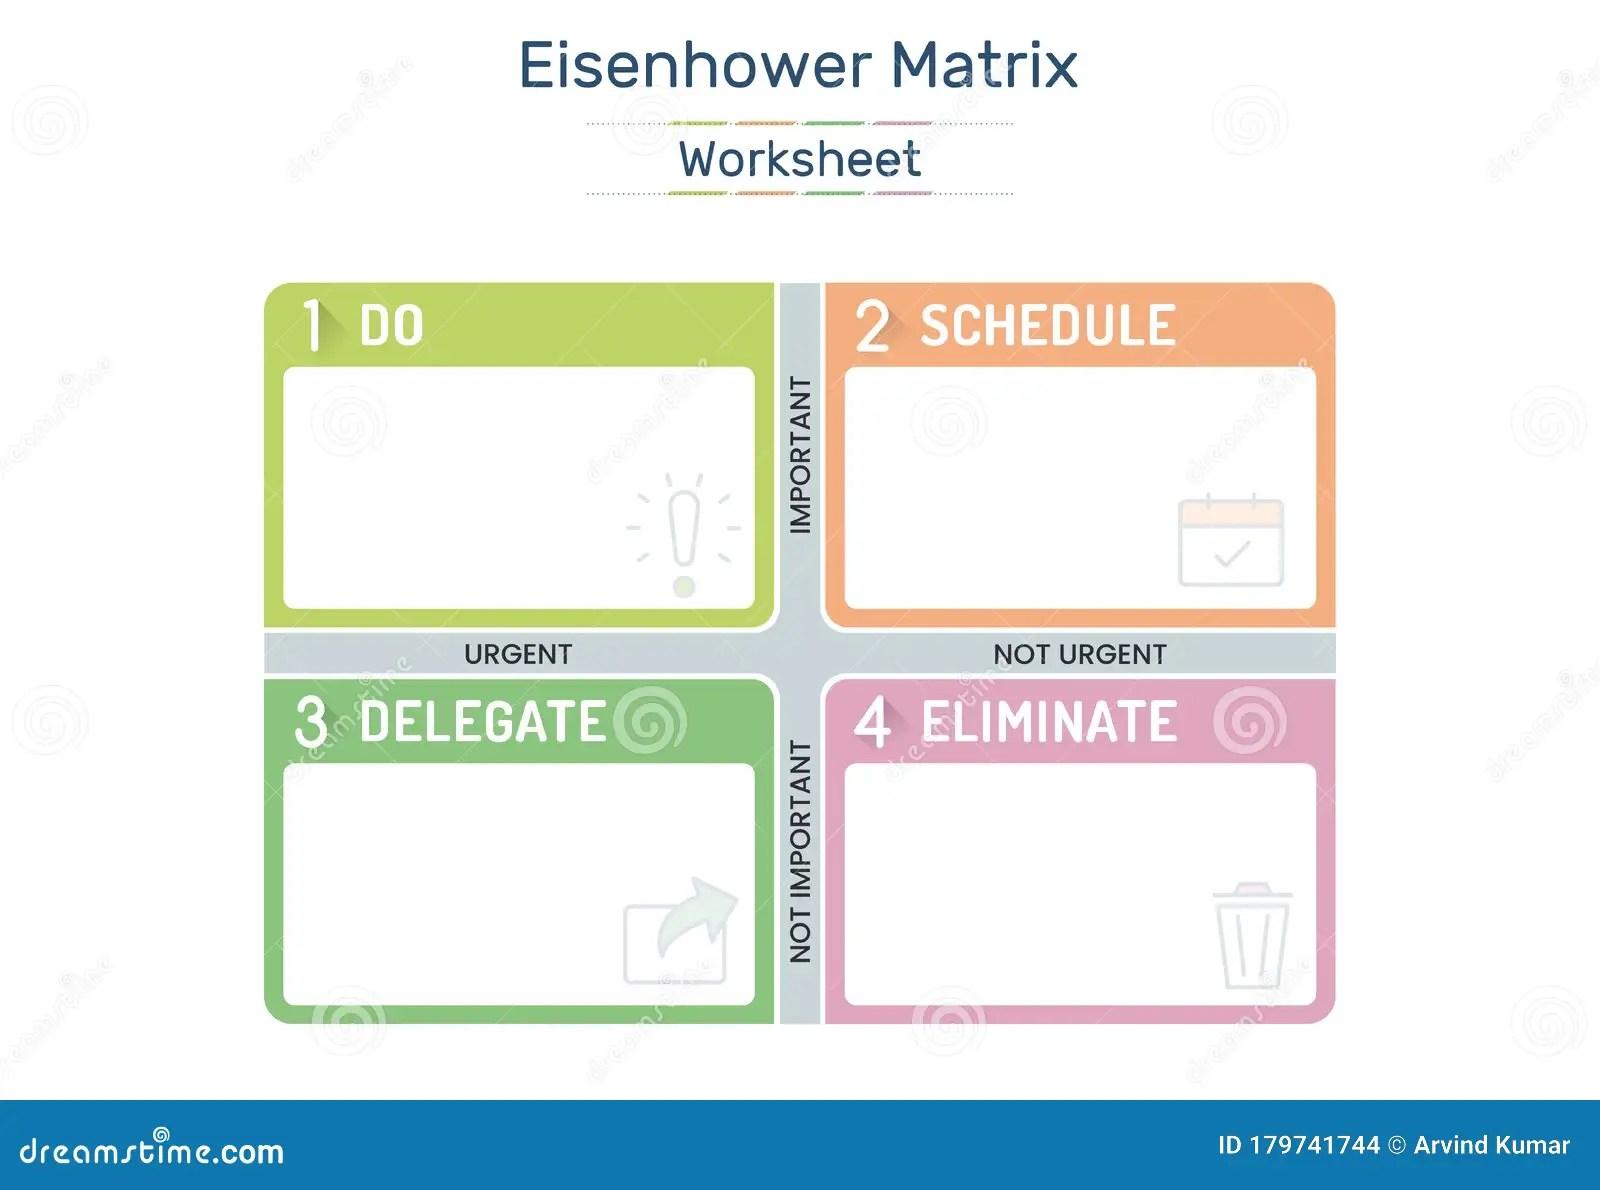 Eisenhower Matrix Worksheet Urgent Important Matrix